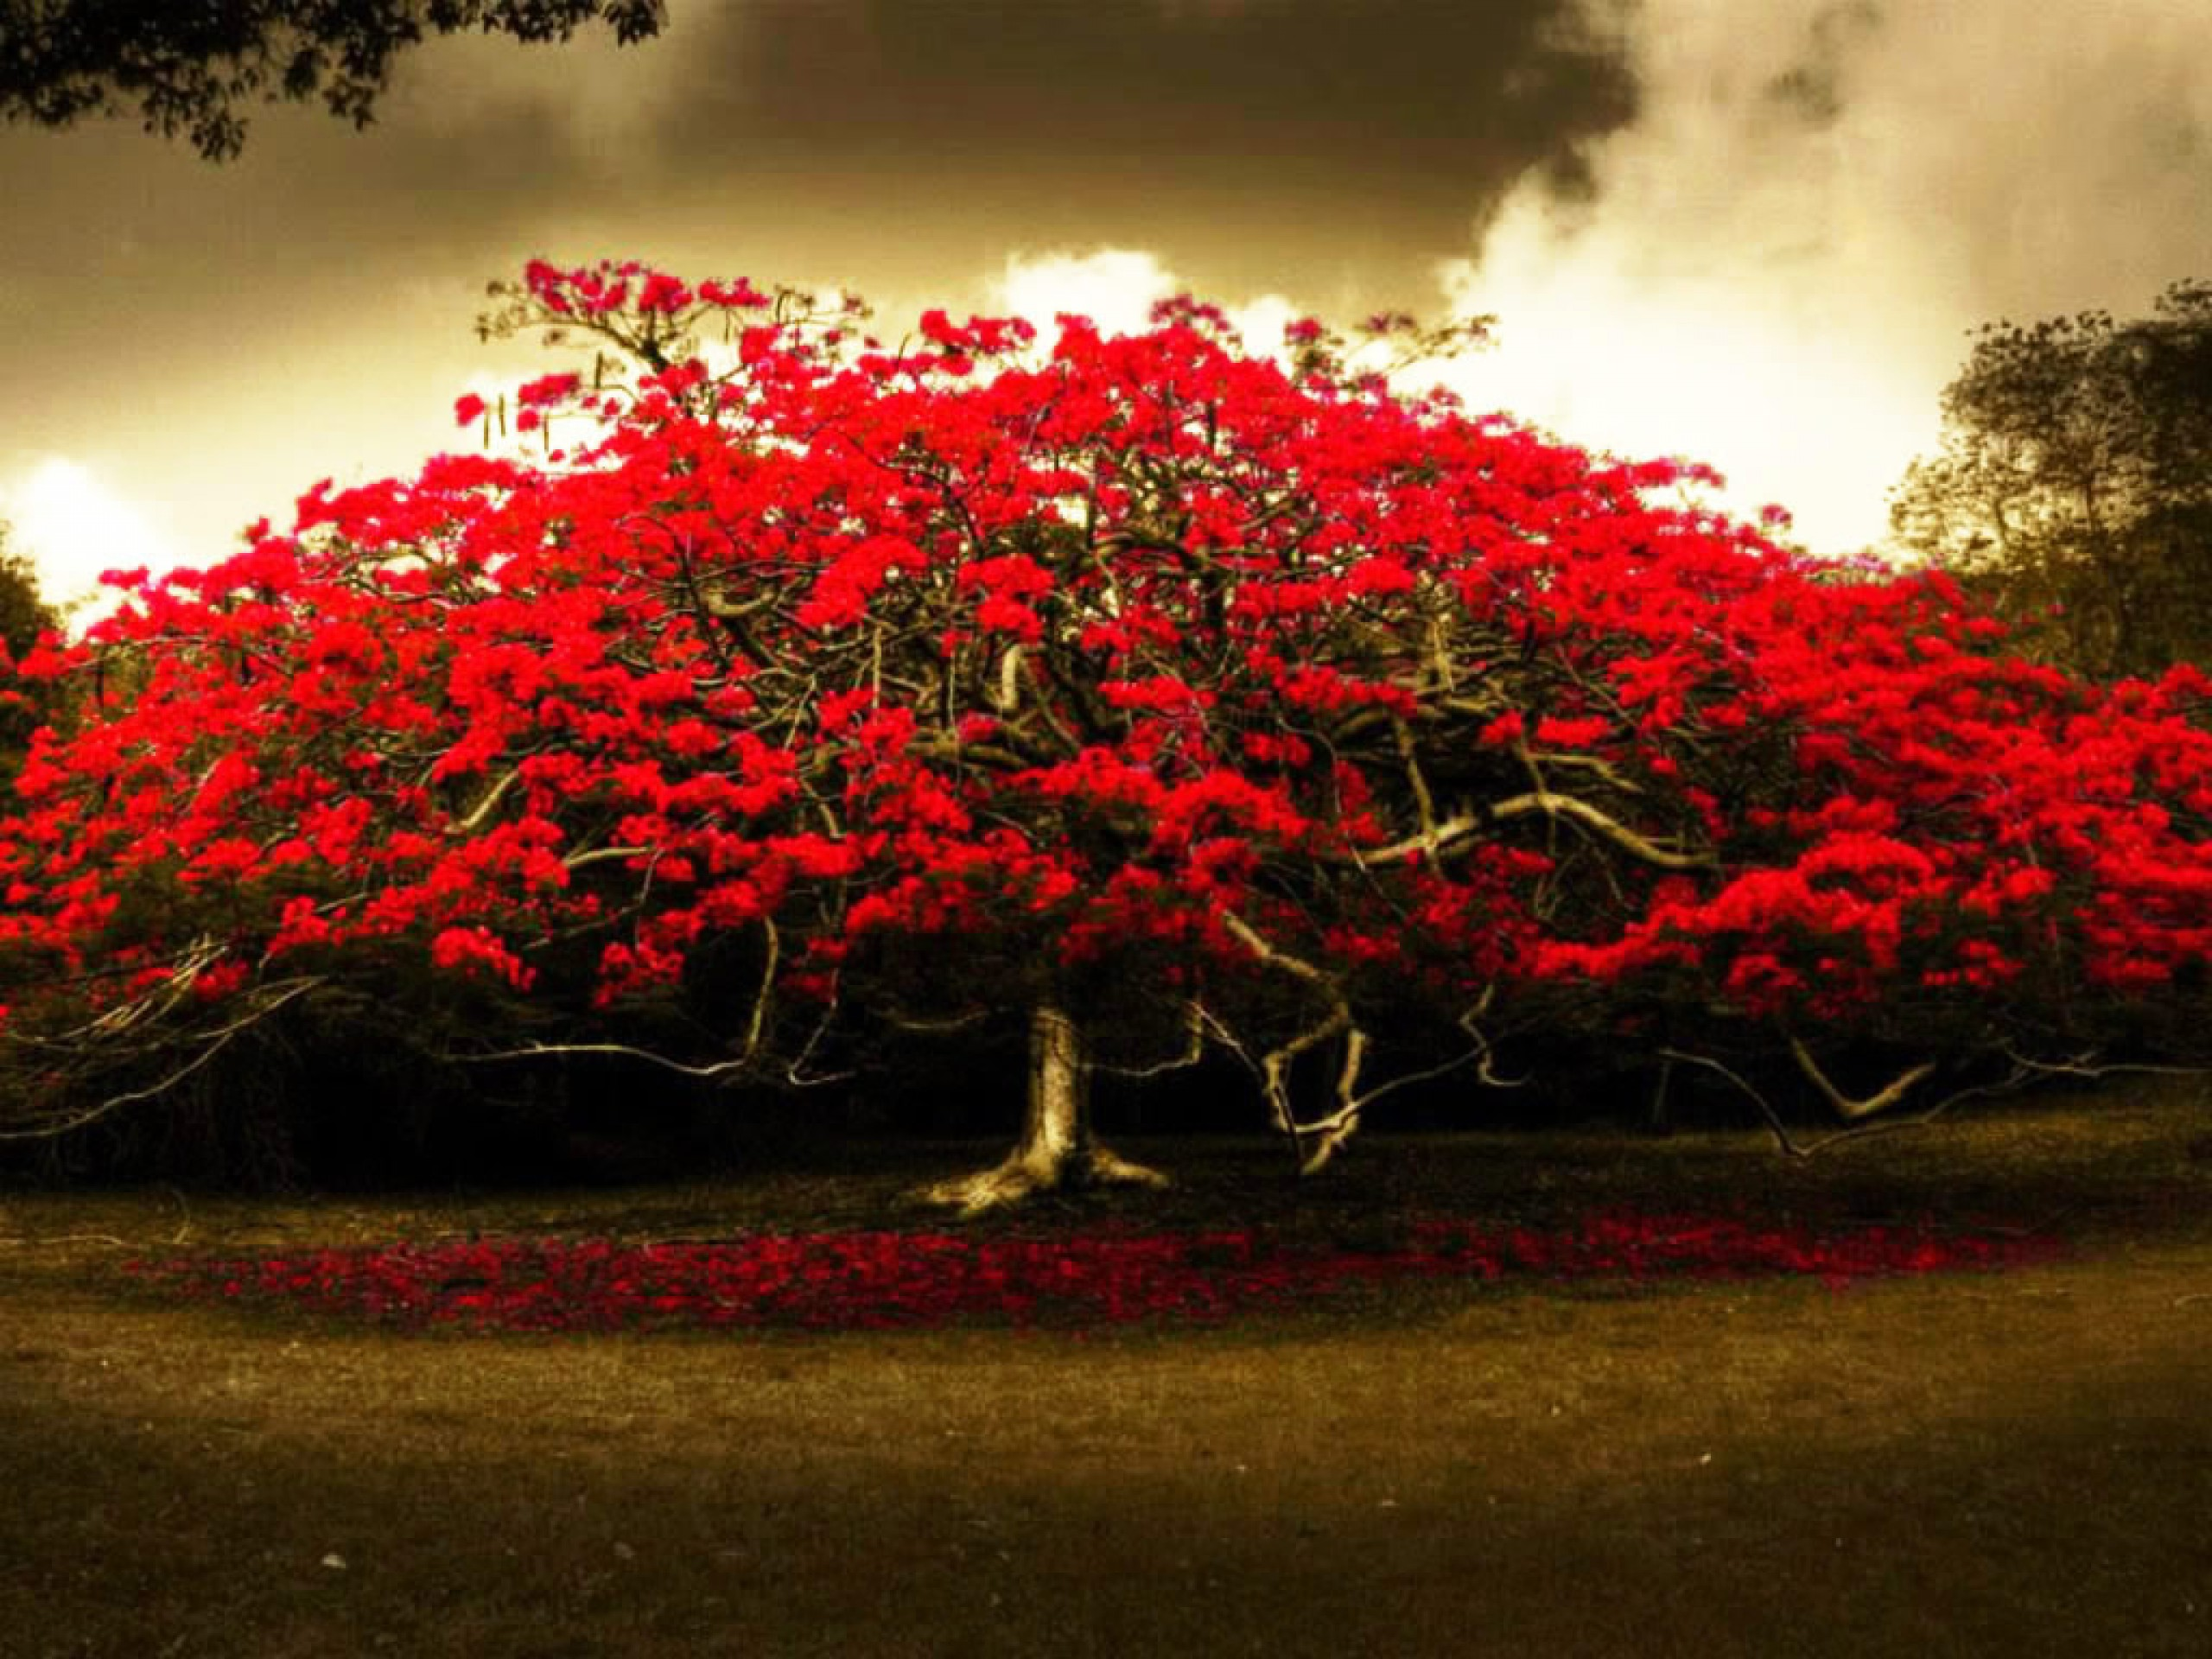 Hd wallpaper tree - Hd Wallpaper Tree Red Flowers Tree Hd Wallpapers Cute Wallpapers